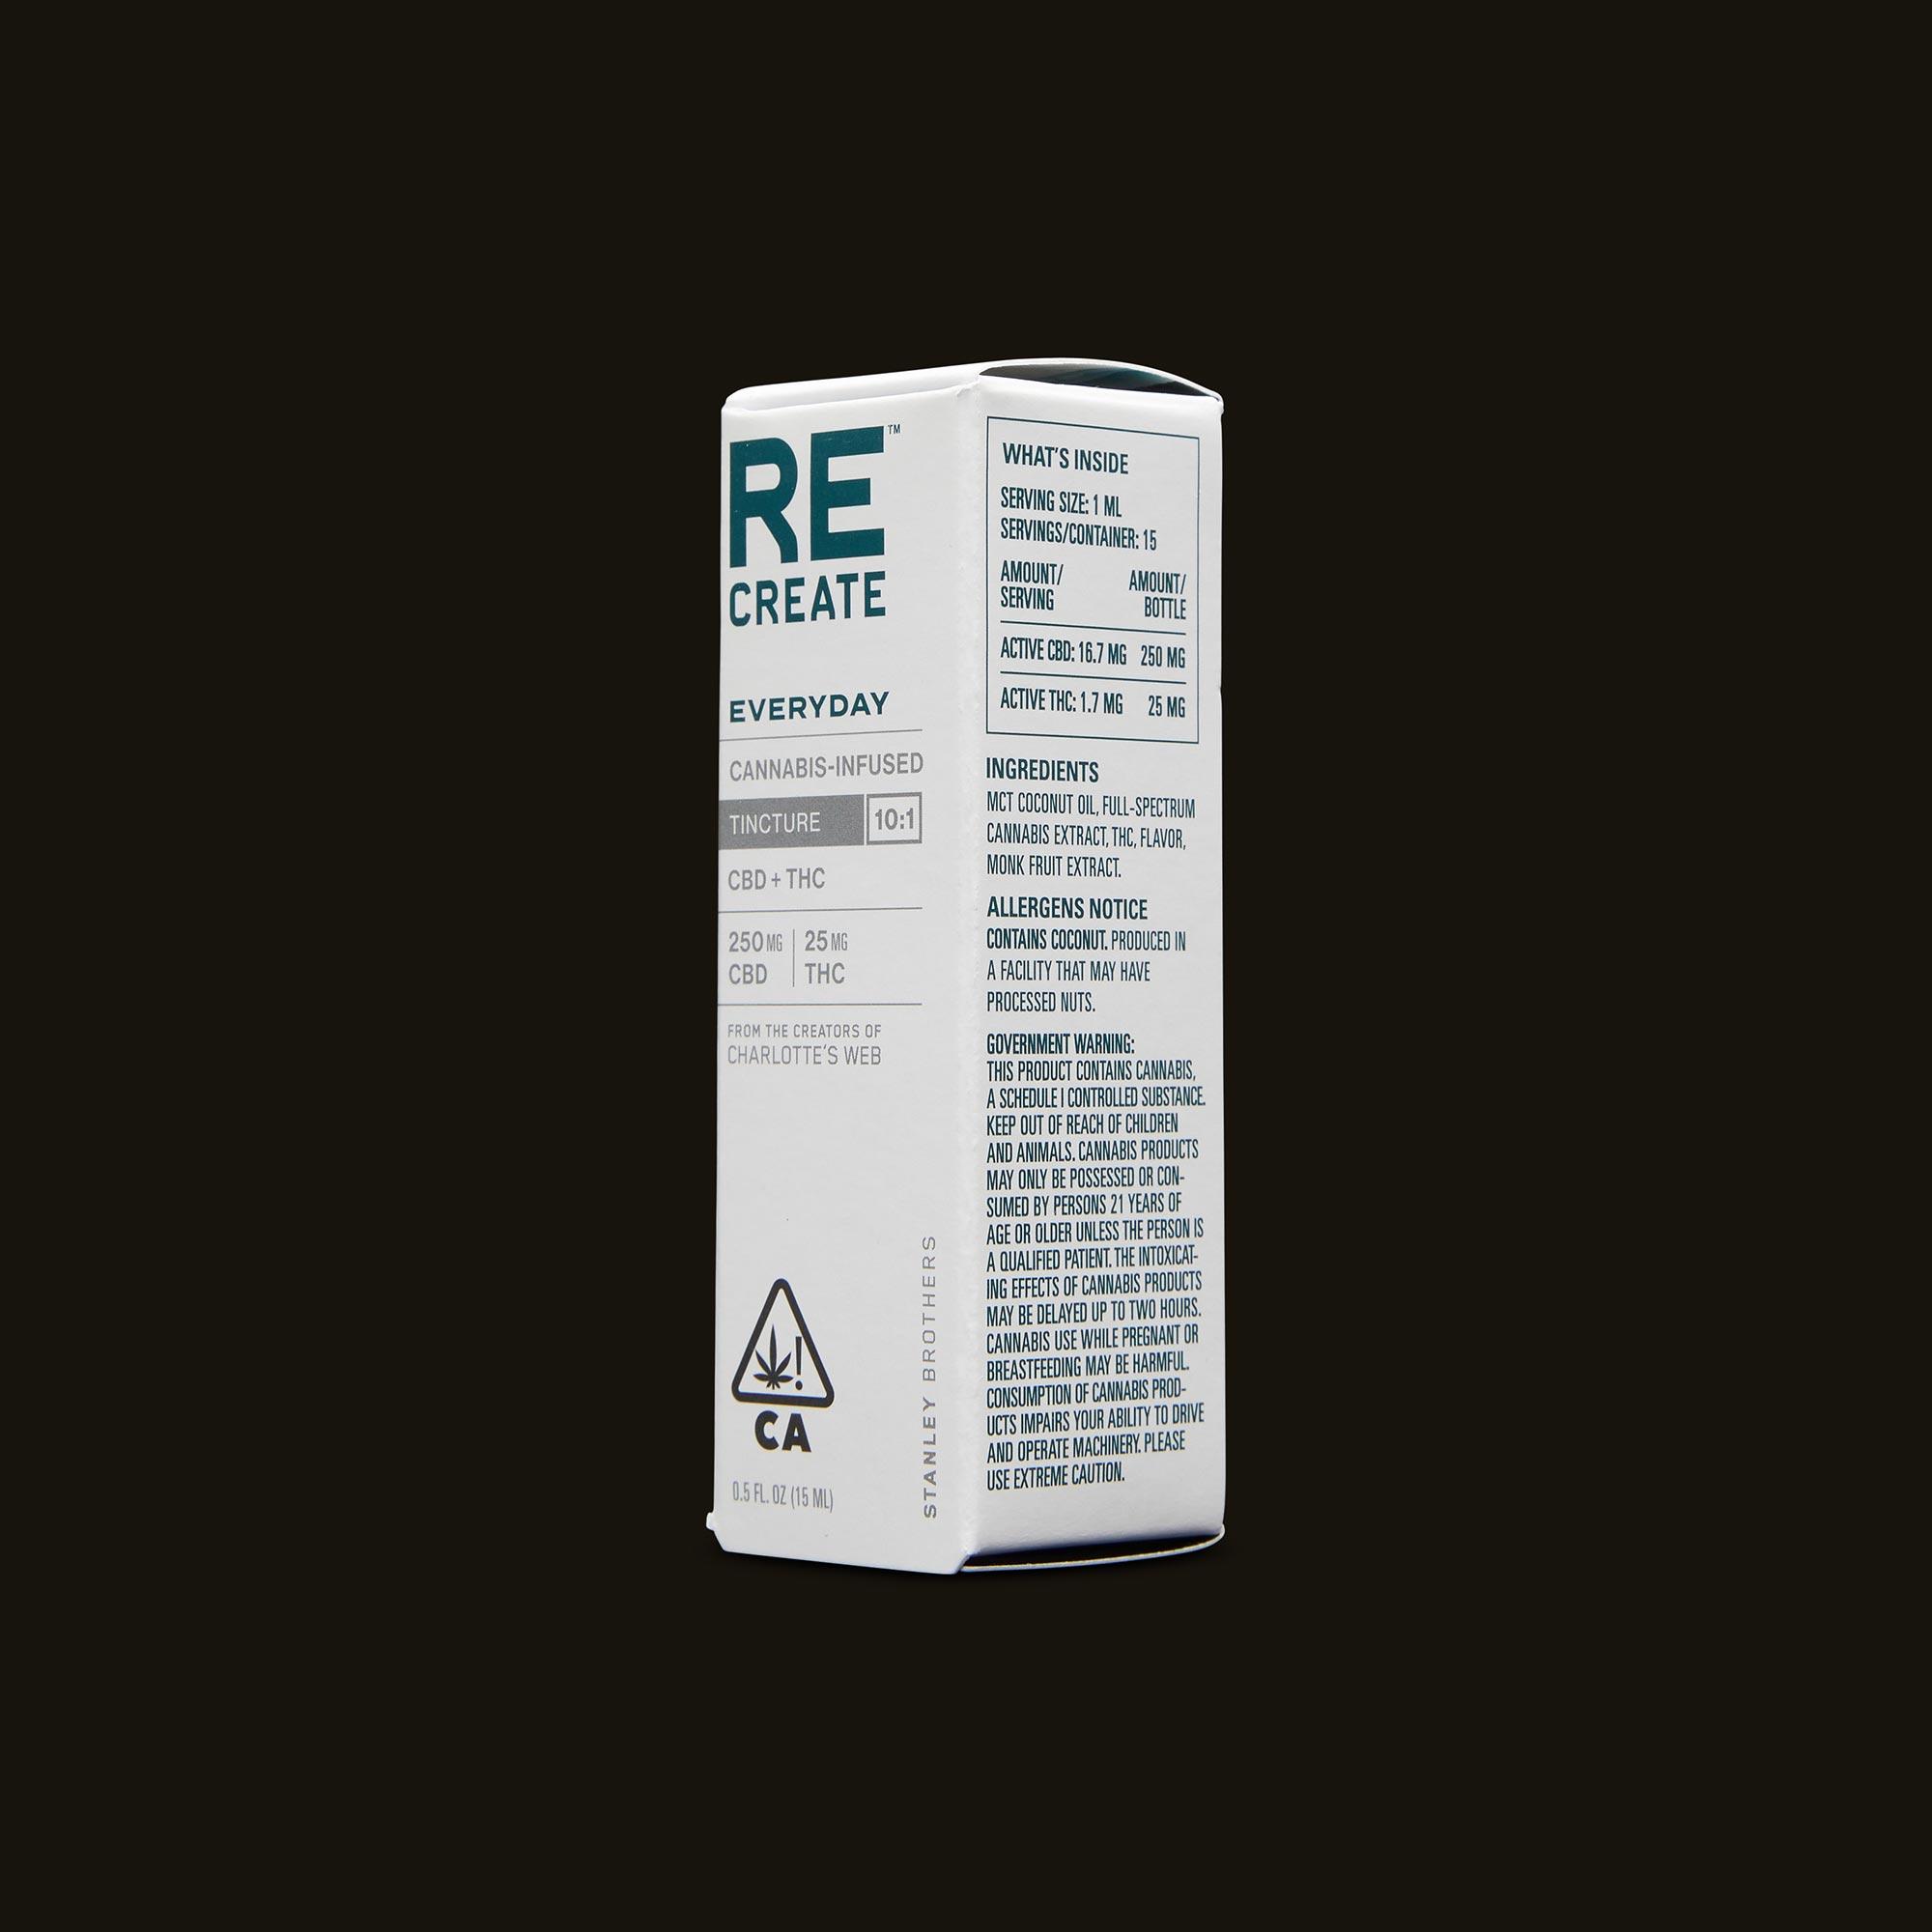 ReCreate Everyday Tincture - 15ml Ingredients